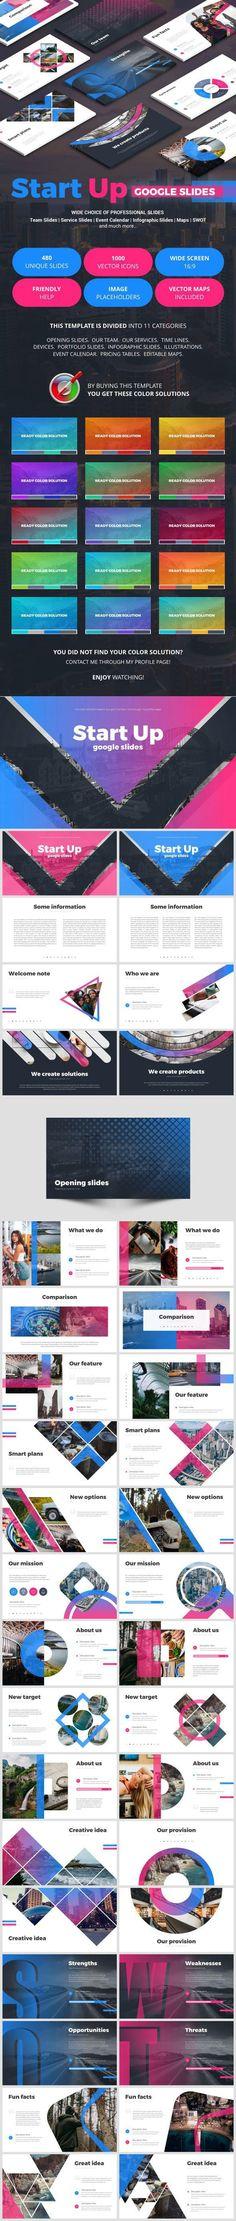 StartUp Keynote - Keynote Business Presentation Template by EvgenyBagro. Business Presentation Templates, Presentation Design Template, Presentation Layout, Design Templates, Keynote Template, Knowledge, Graphic Design, Thoughts, Google